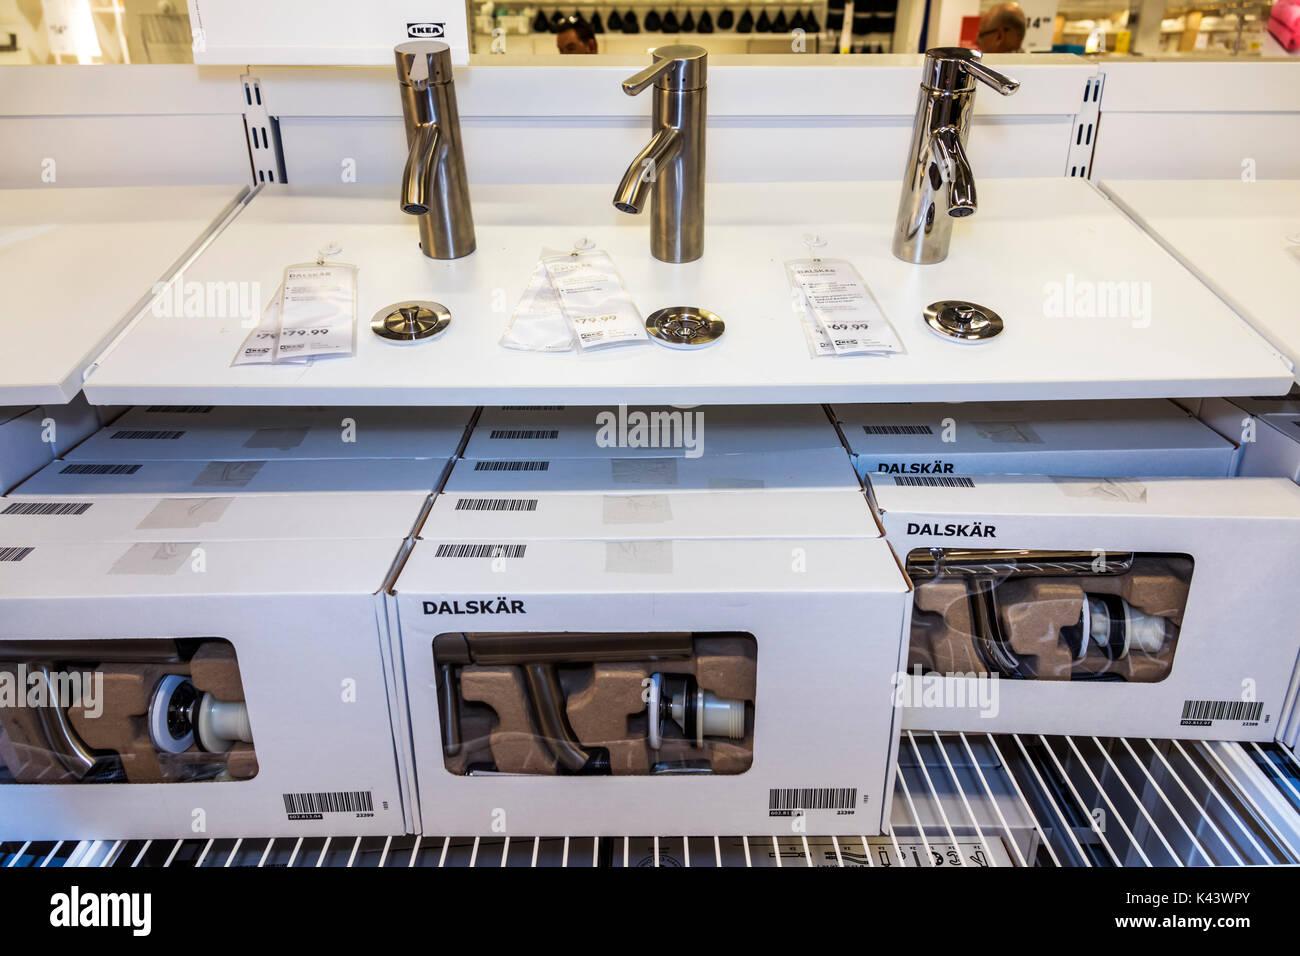 Miami Florida IKEA bathroom faucet Dalskar display sale new Stock ...